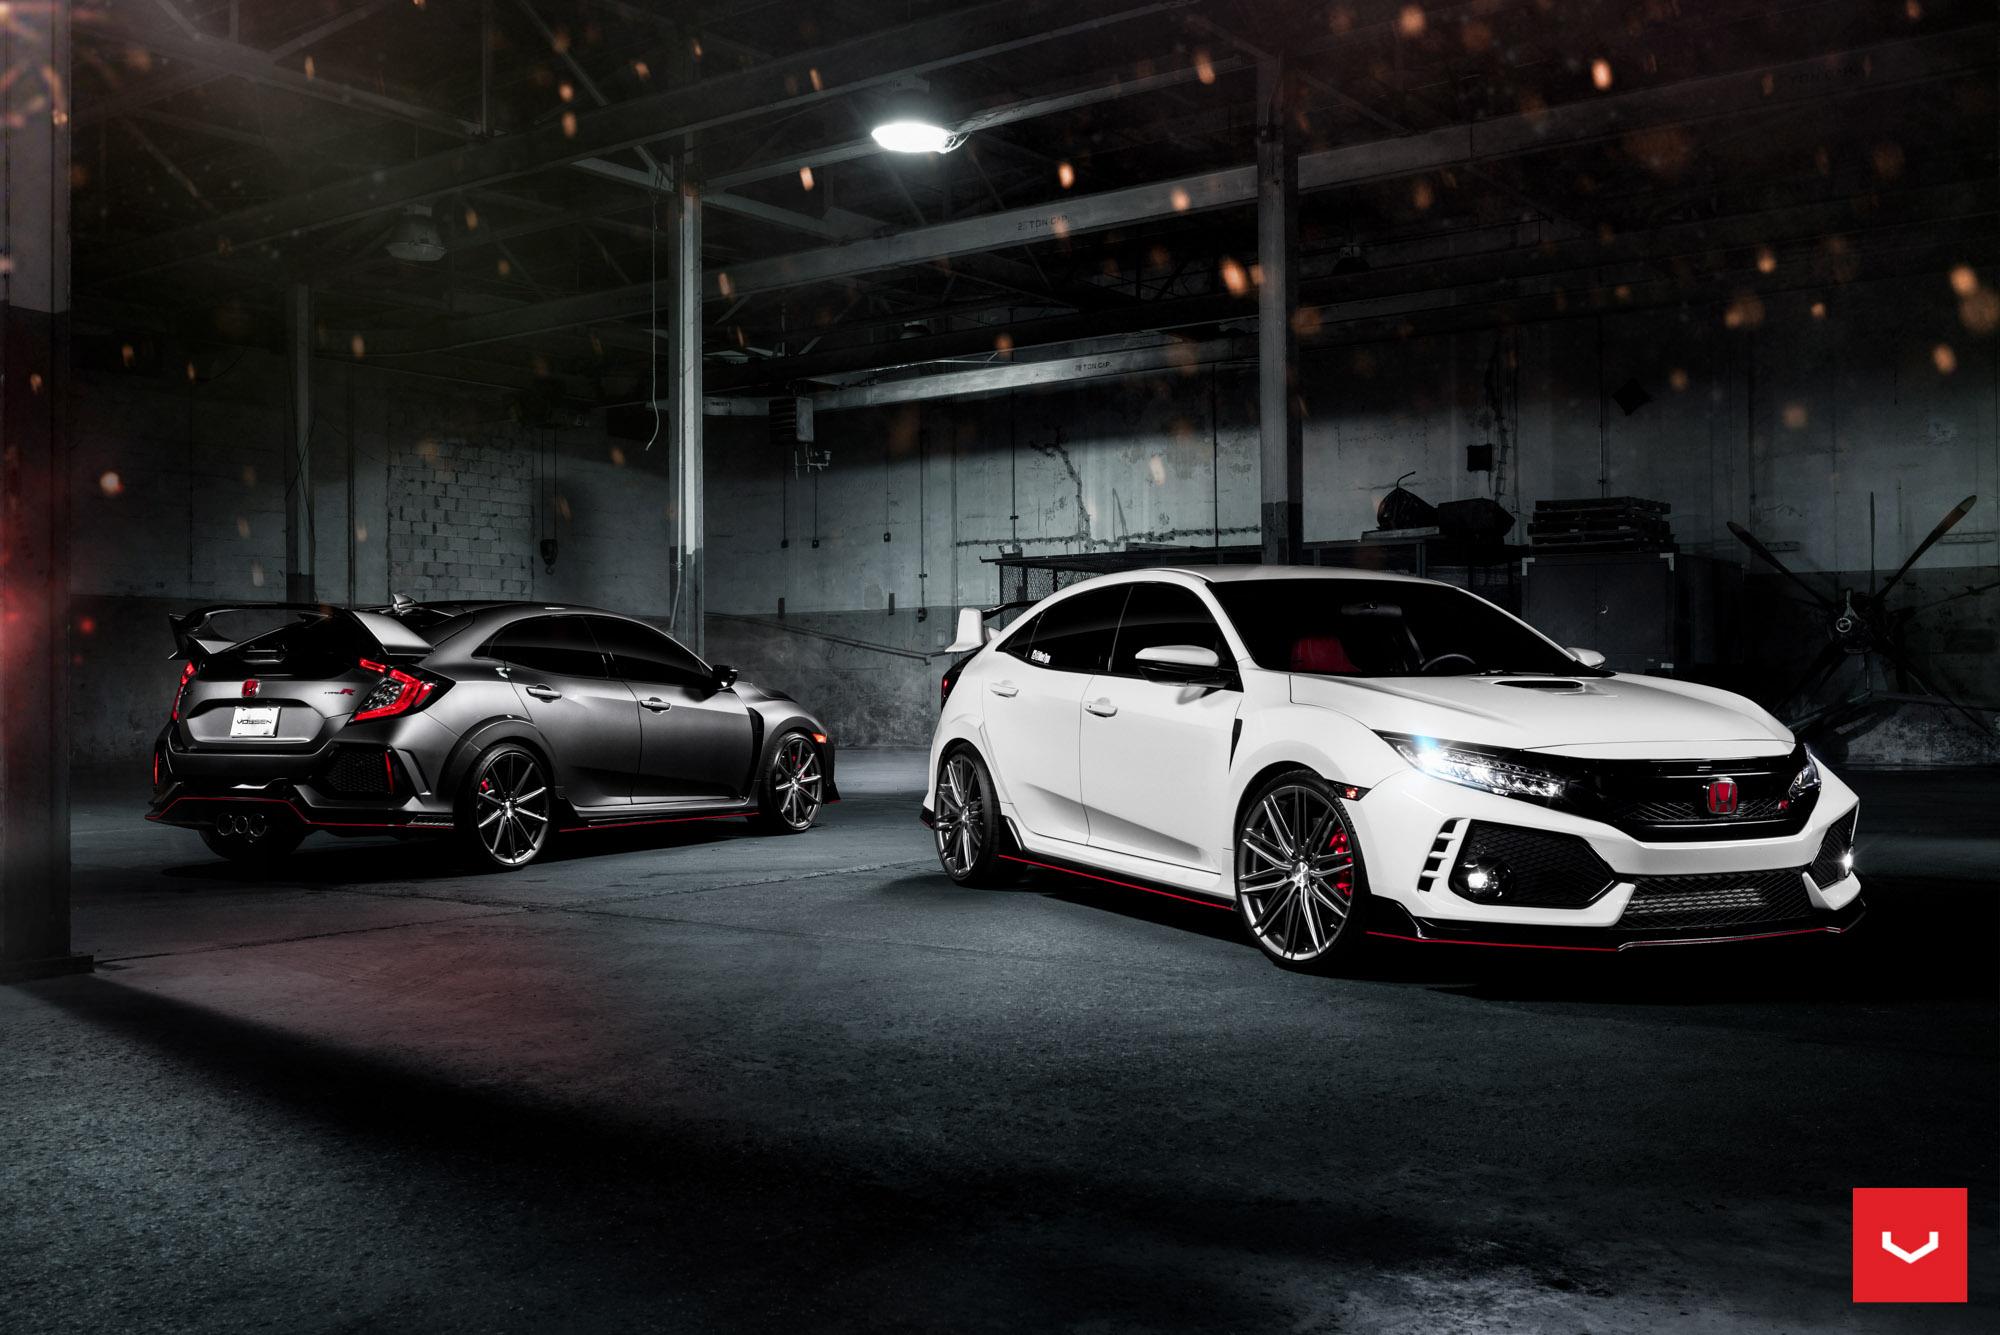 2018 honda integra.  Honda Intended 2018 Honda Integra I